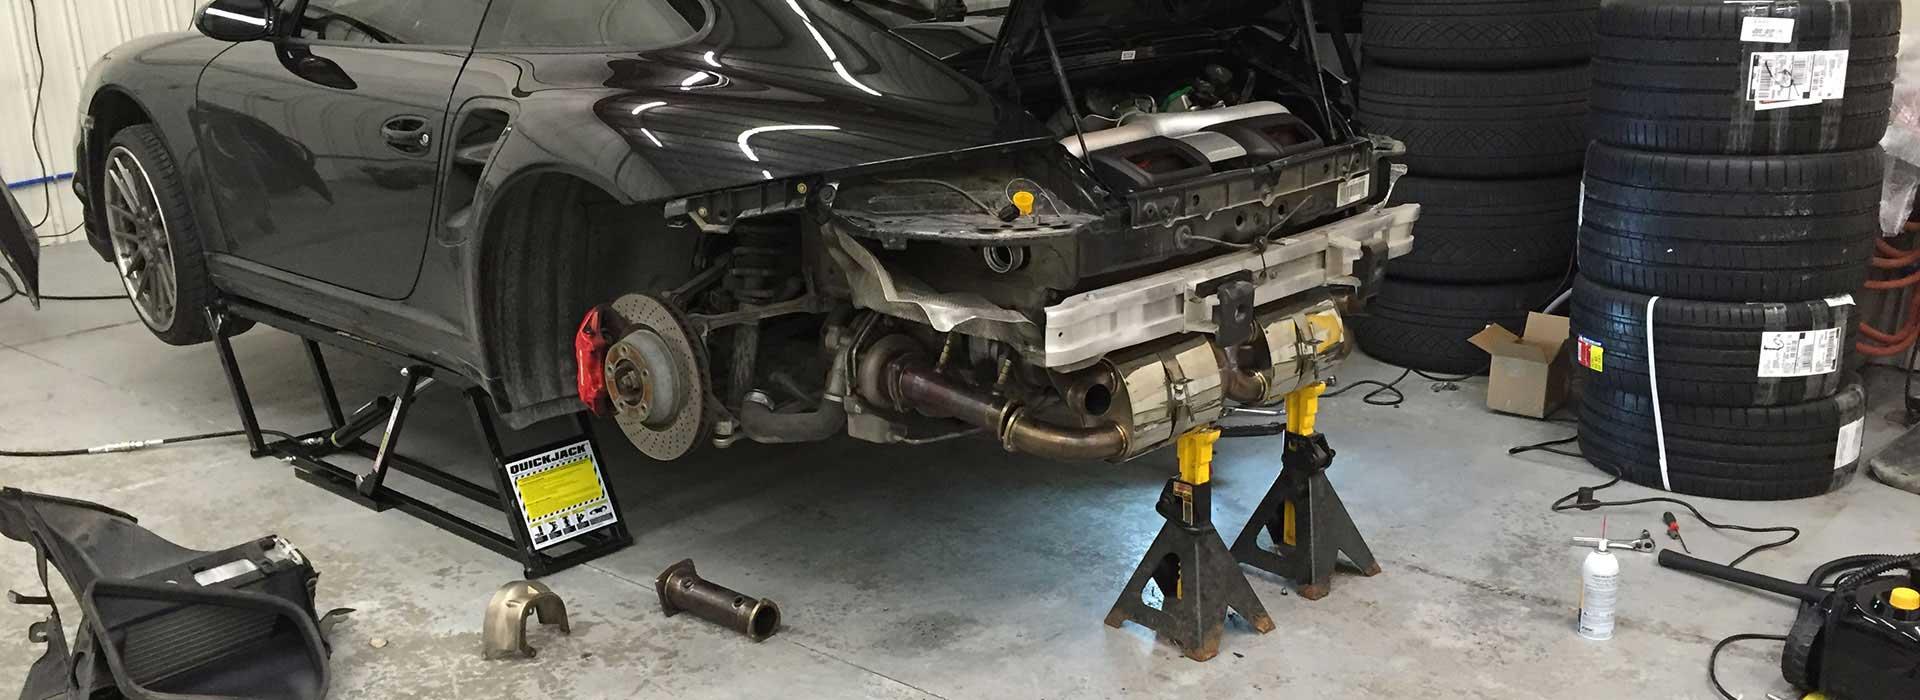 Car Lift Repair Shop